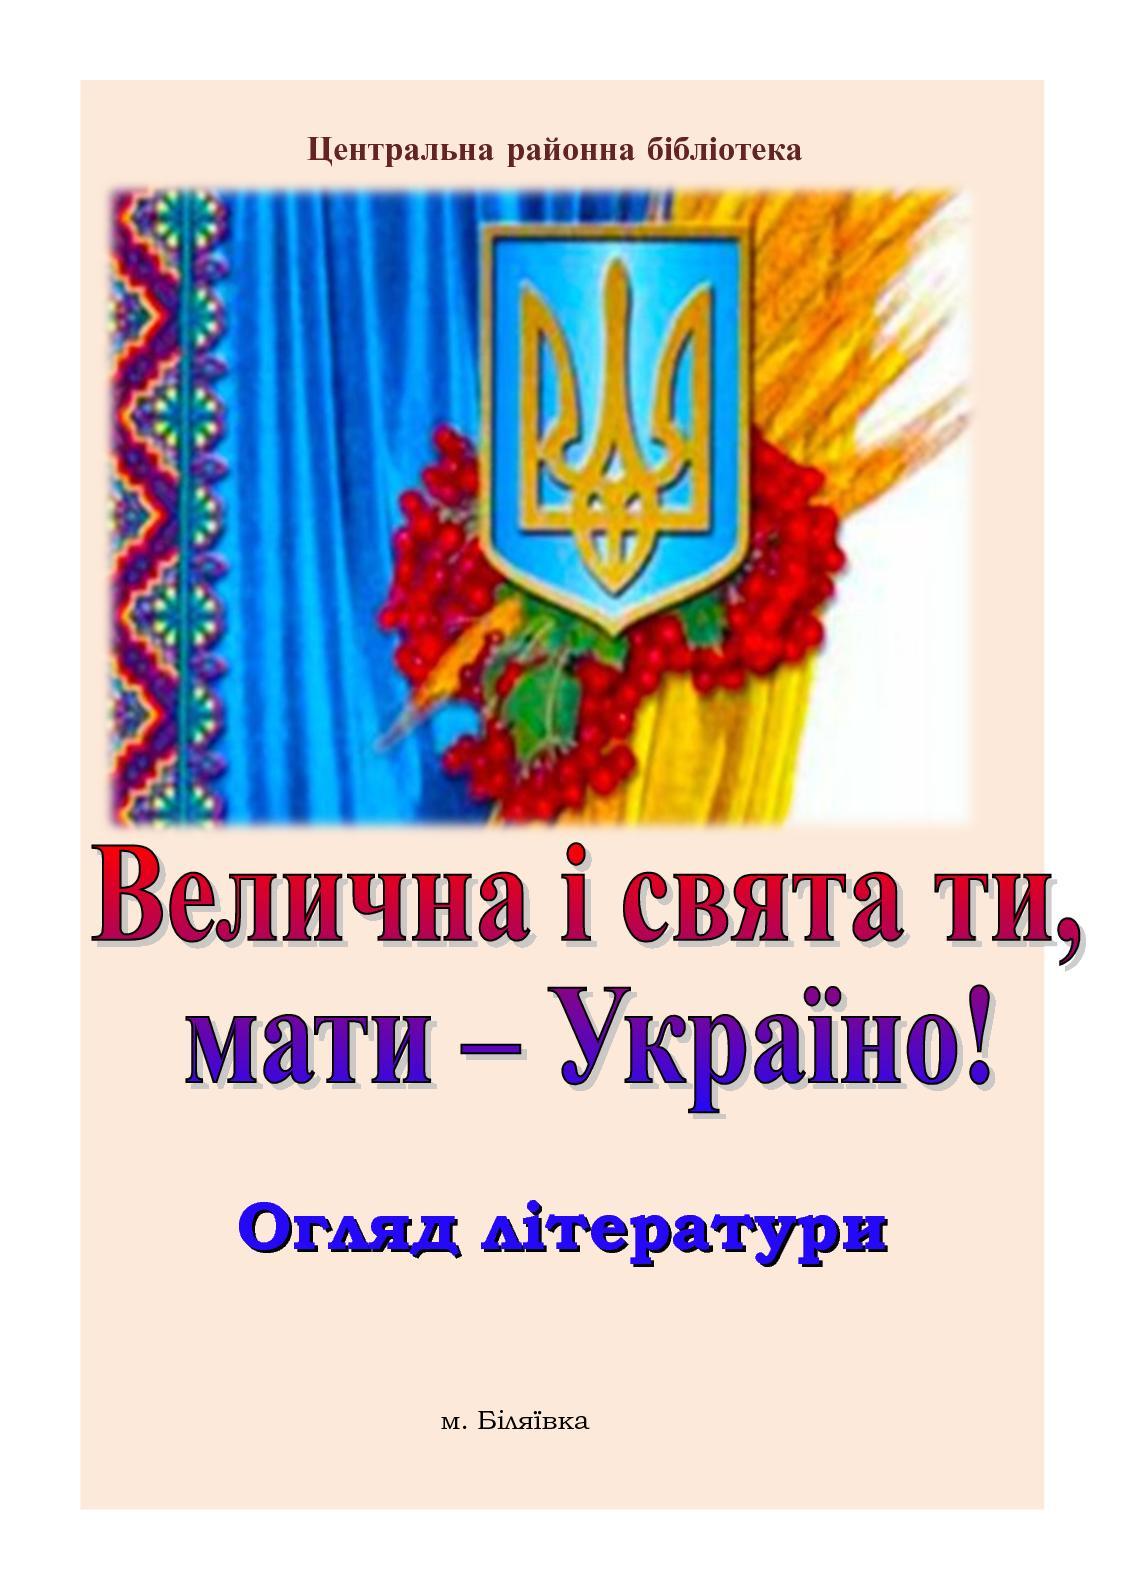 Велична і свята ти, мати - Україно!